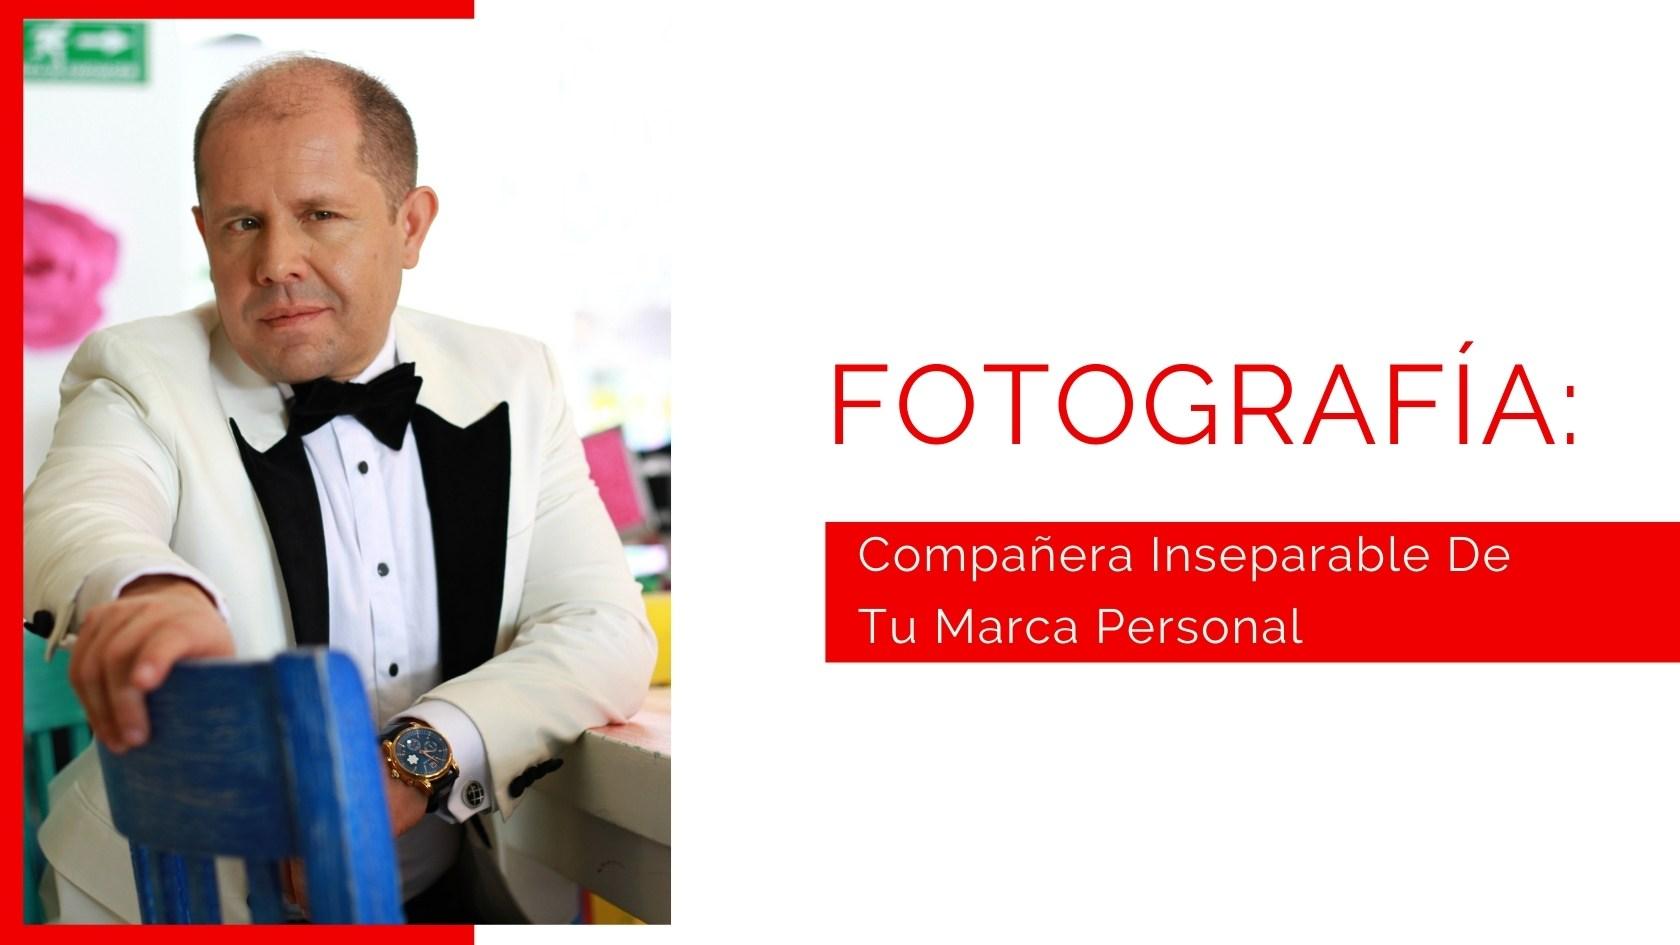 Hector Jimenez - Fotografia - Compañera Inseparable De Tu Marca Personal - 1